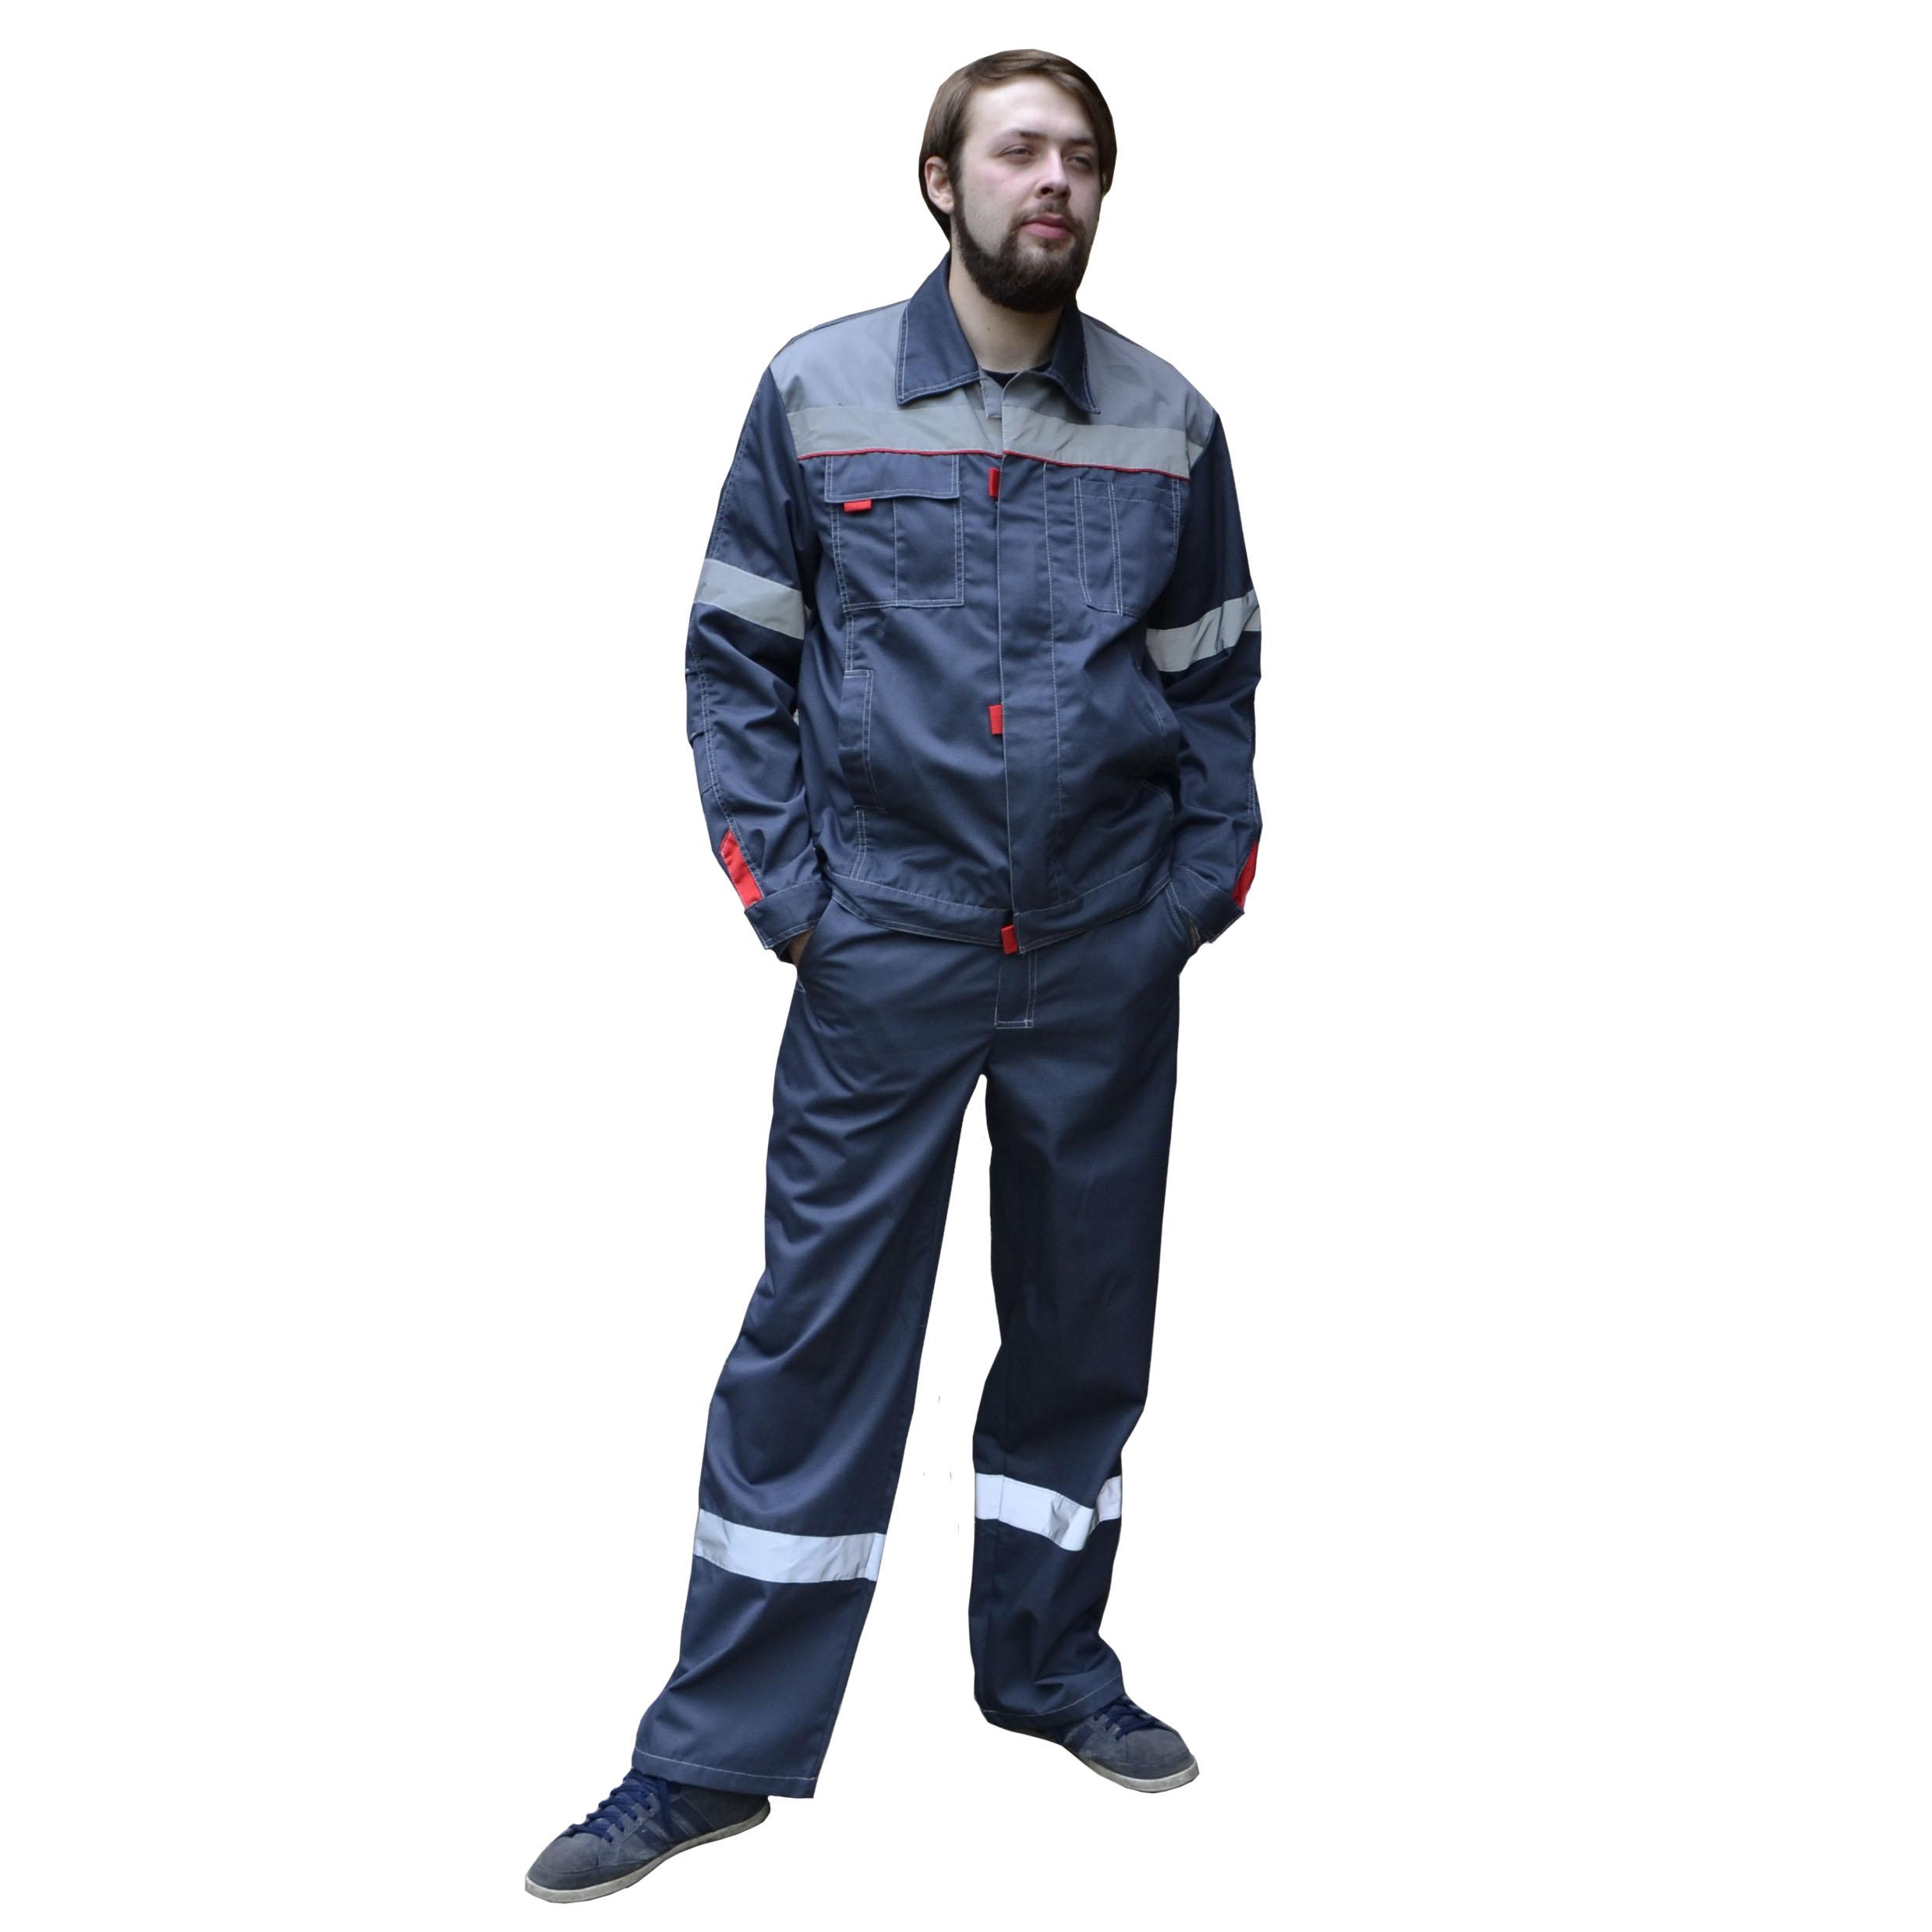 Костюм «Фаворит-СП» куртка+брюки т.серый с серым, СОП, тк. Твилл 240 гр.